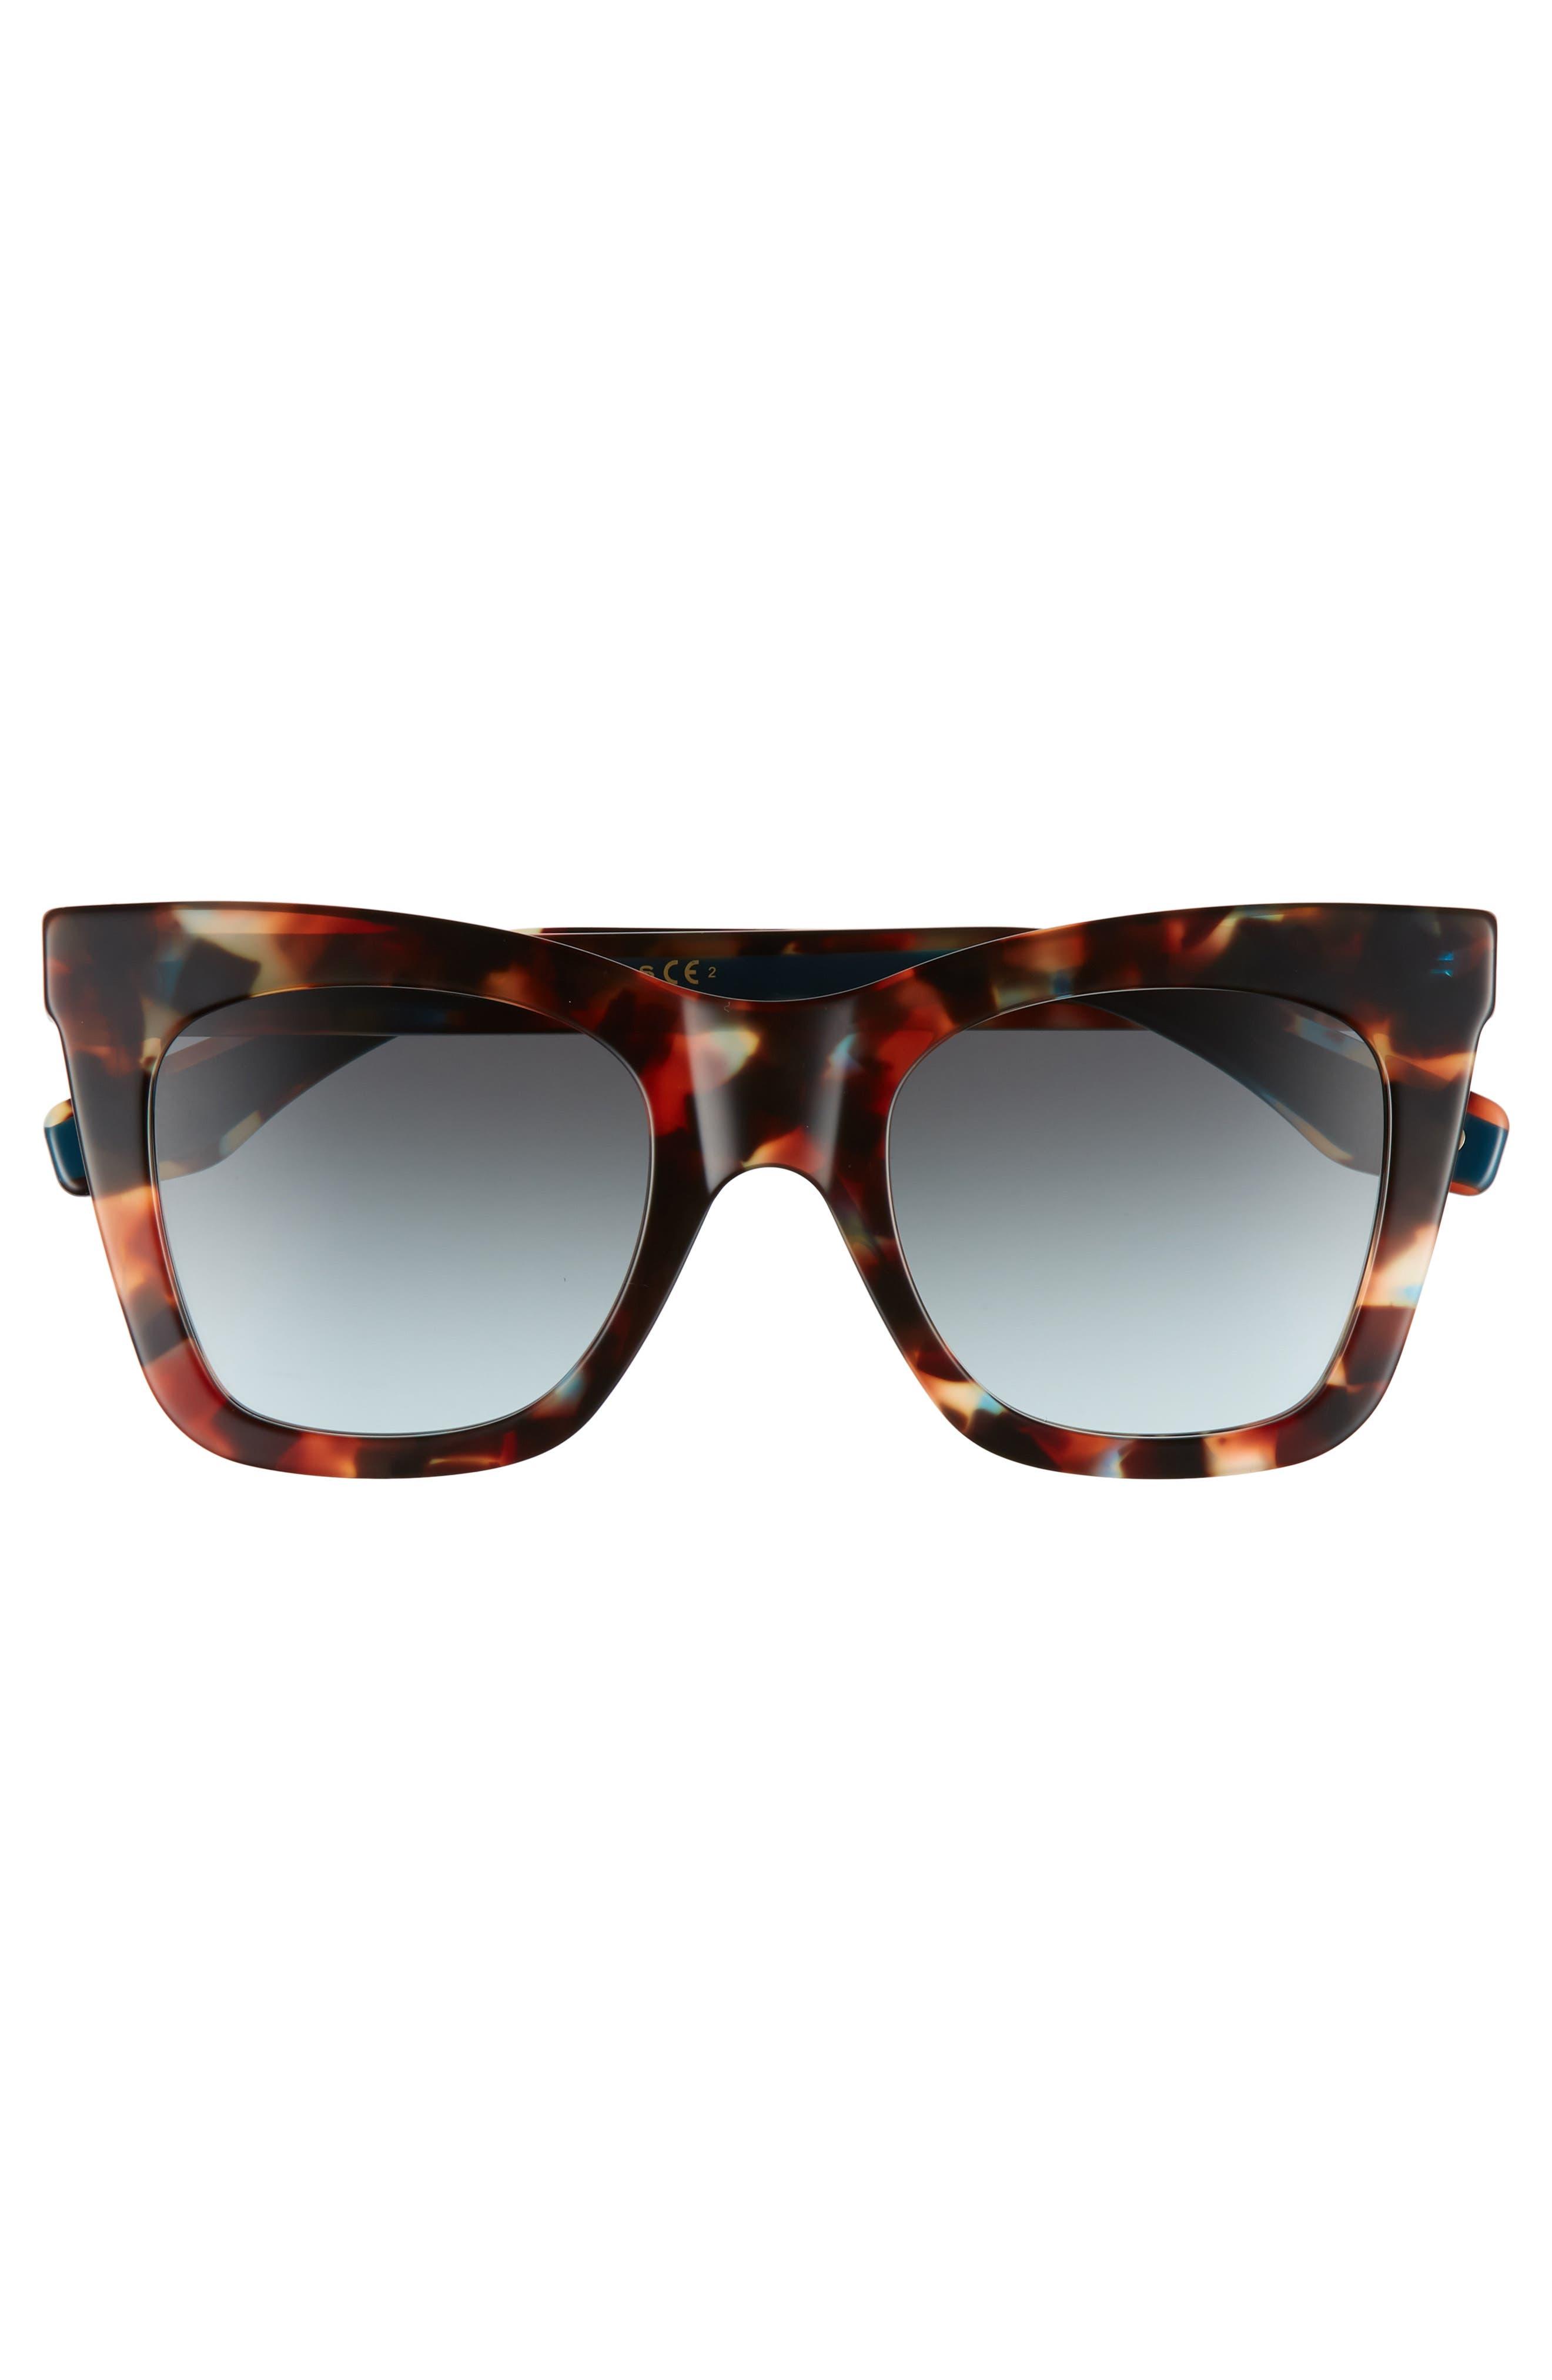 50mm Cat Eye Sunglasses,                             Alternate thumbnail 3, color,                             Havnturqu